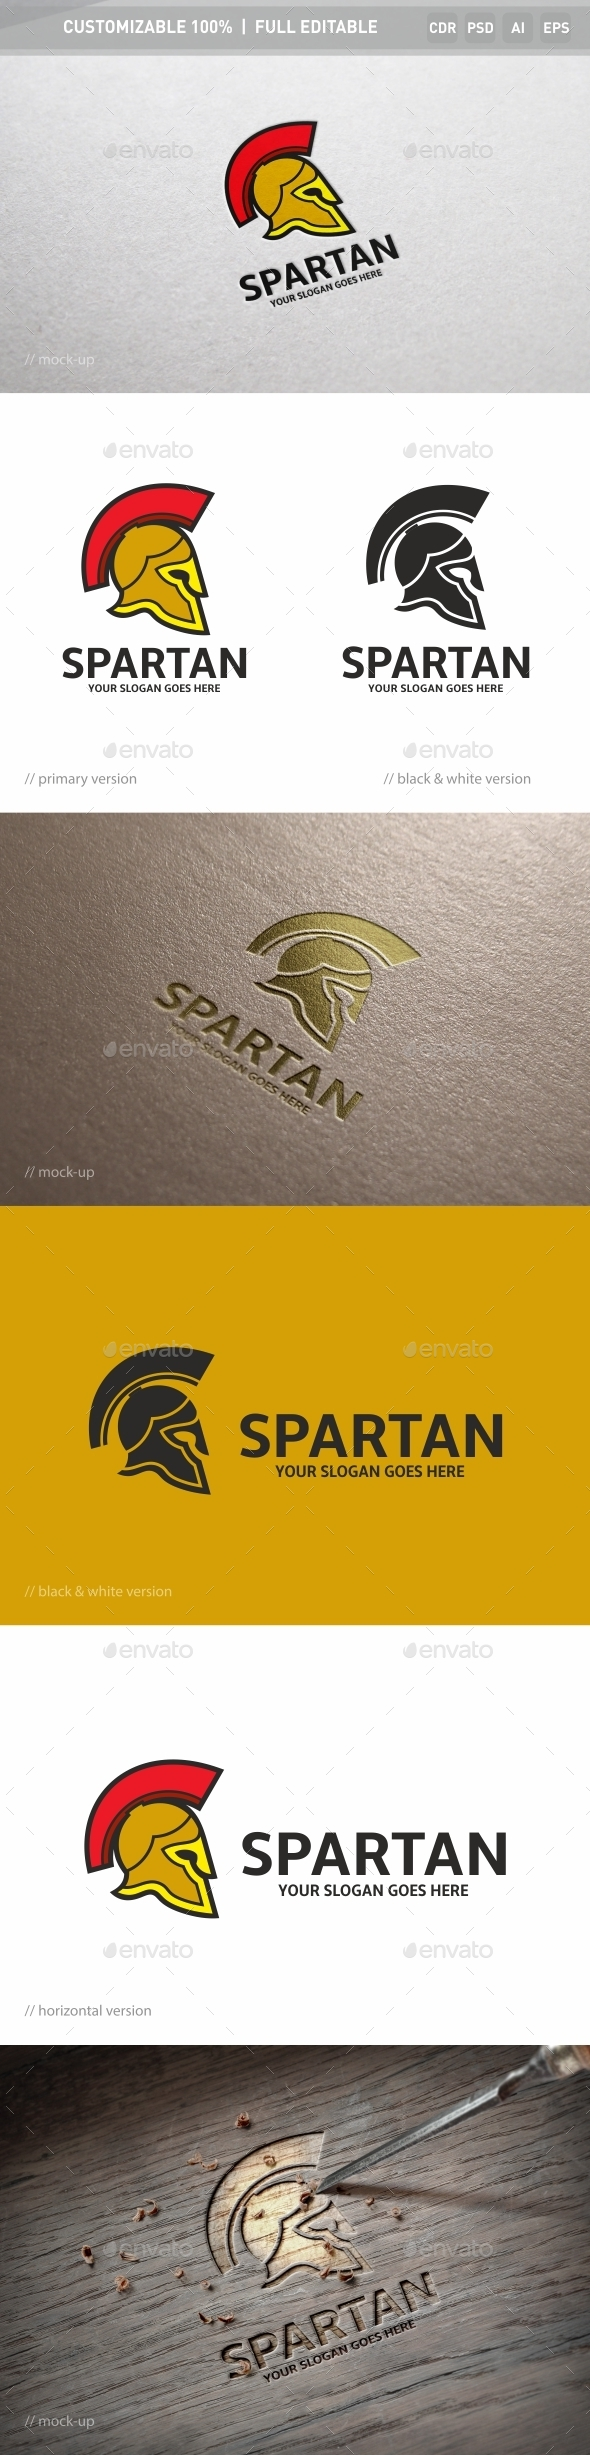 Spartan Logo Template - Objects Logo Templates